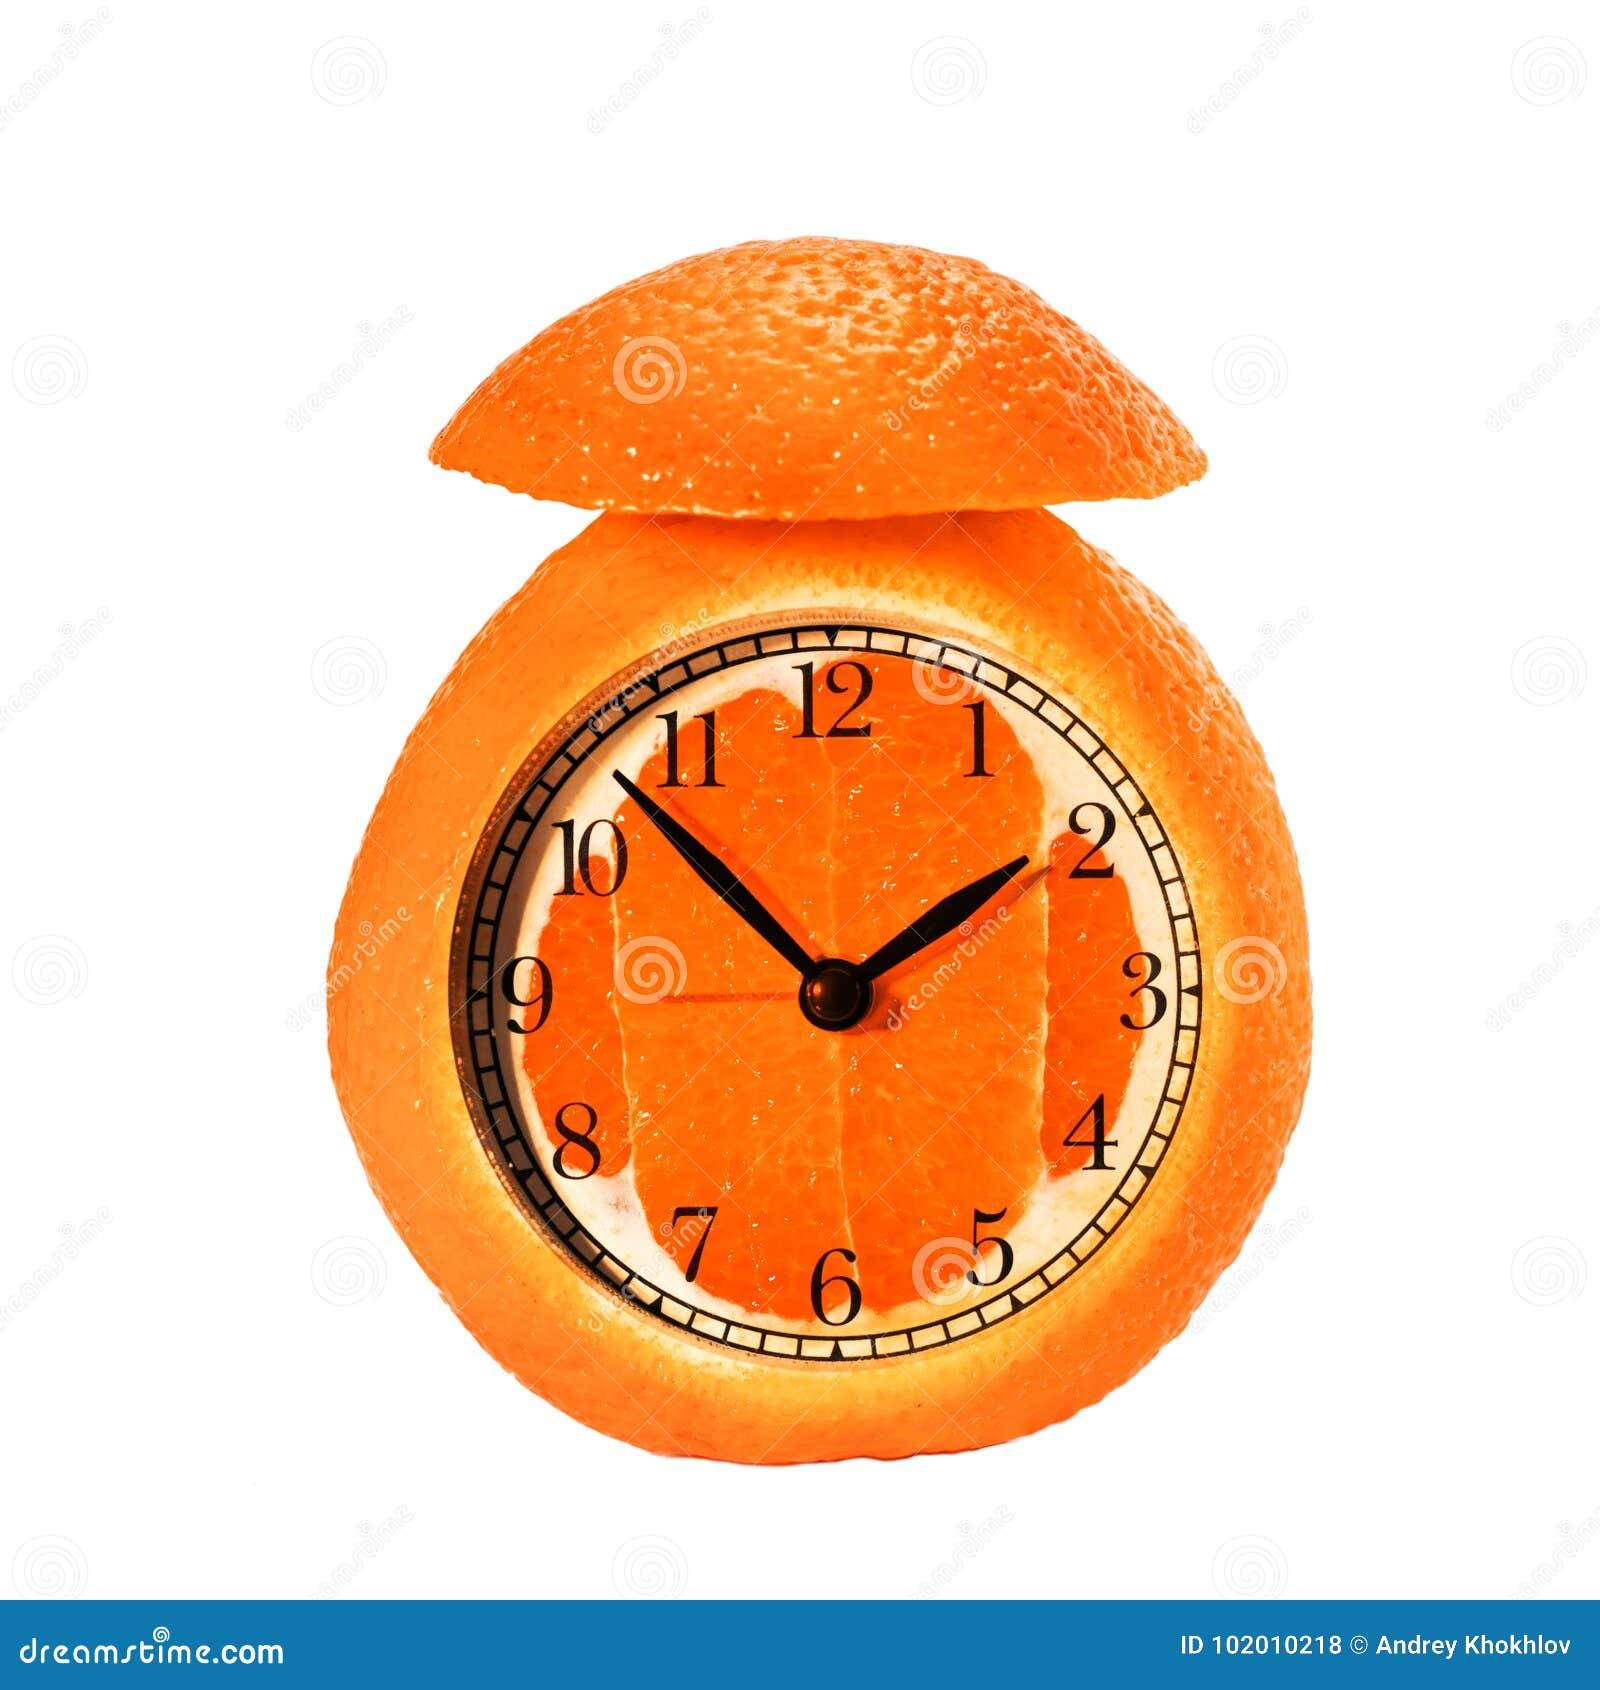 Alarm Clock Made Of Orange Fruit Stock Photo - Image of fruit, cross